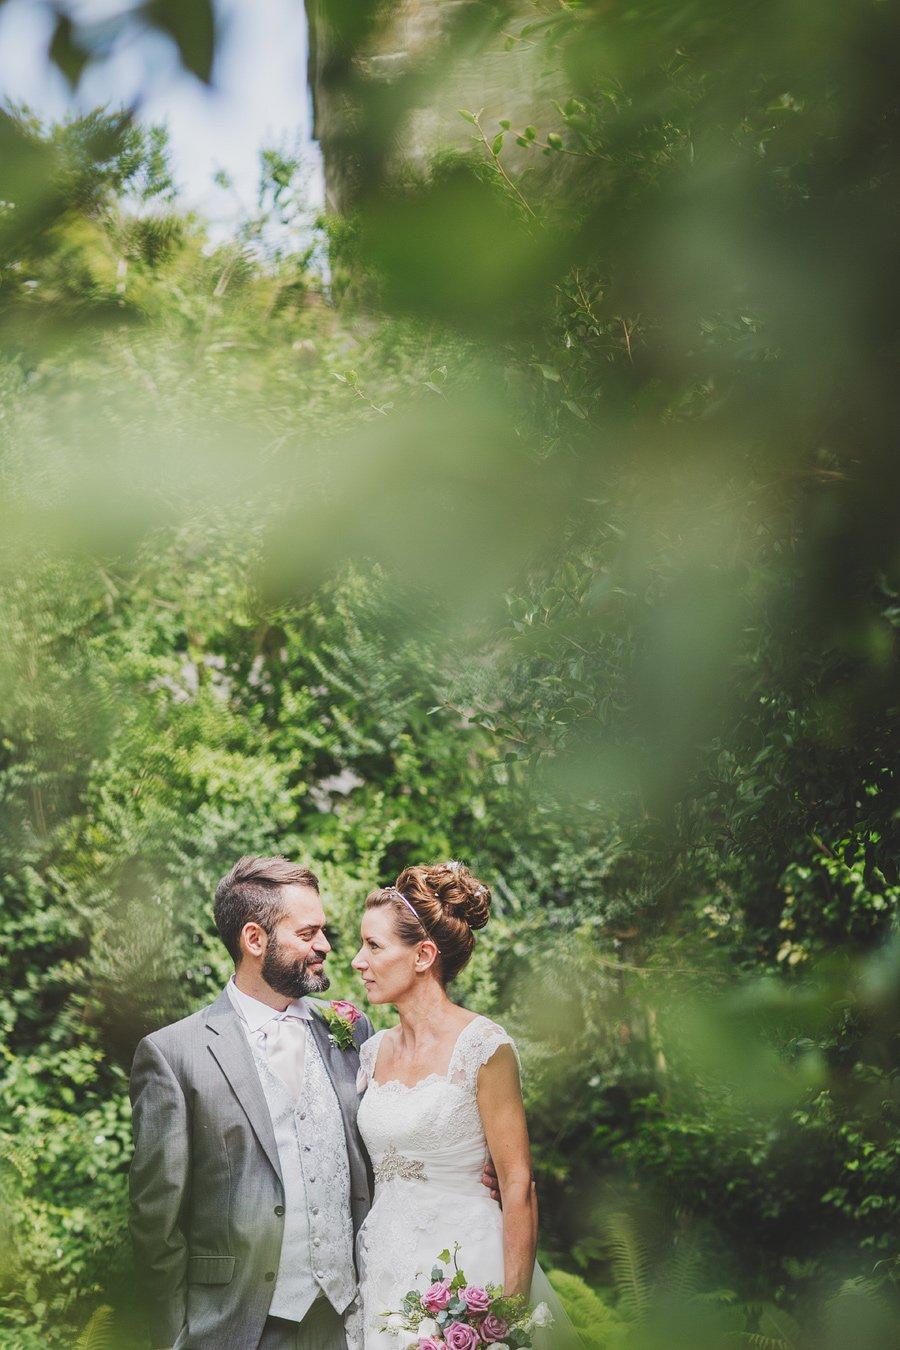 Nymans-Garden-Wedding-Kim-and-Lee-42